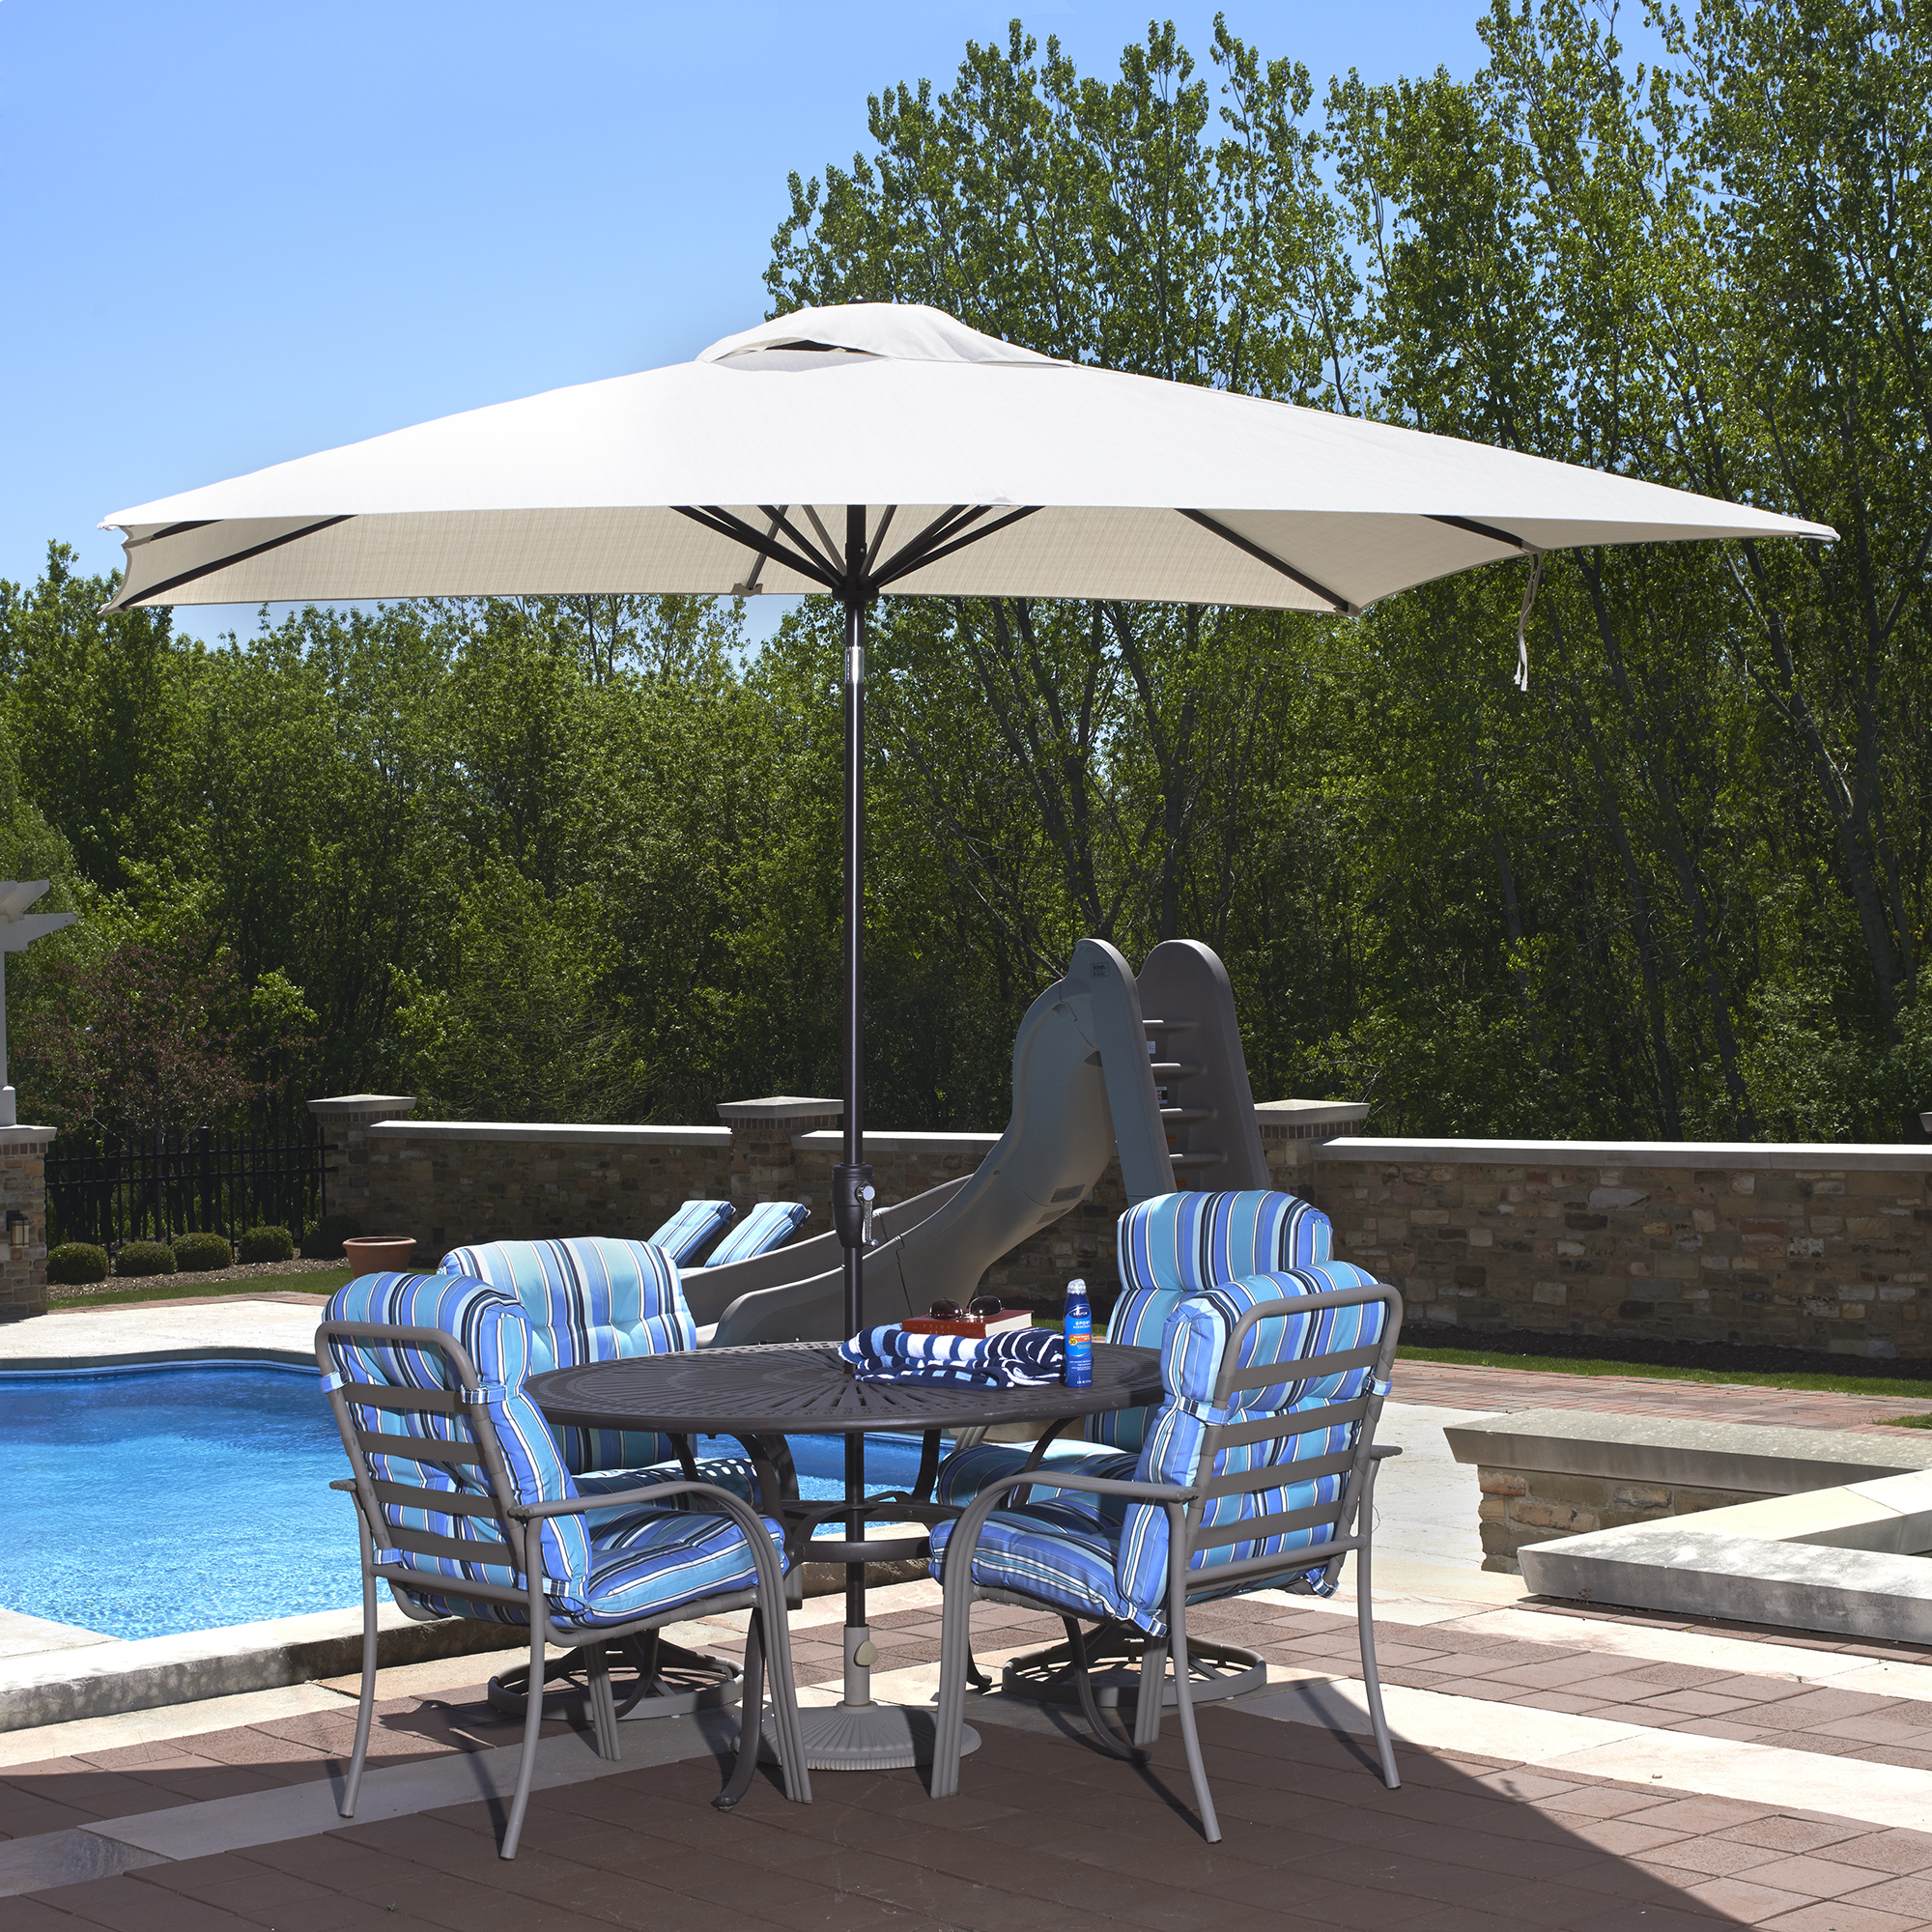 Swim Time Caspian 8' x 10' Rectangular Market Umbrella by Generic